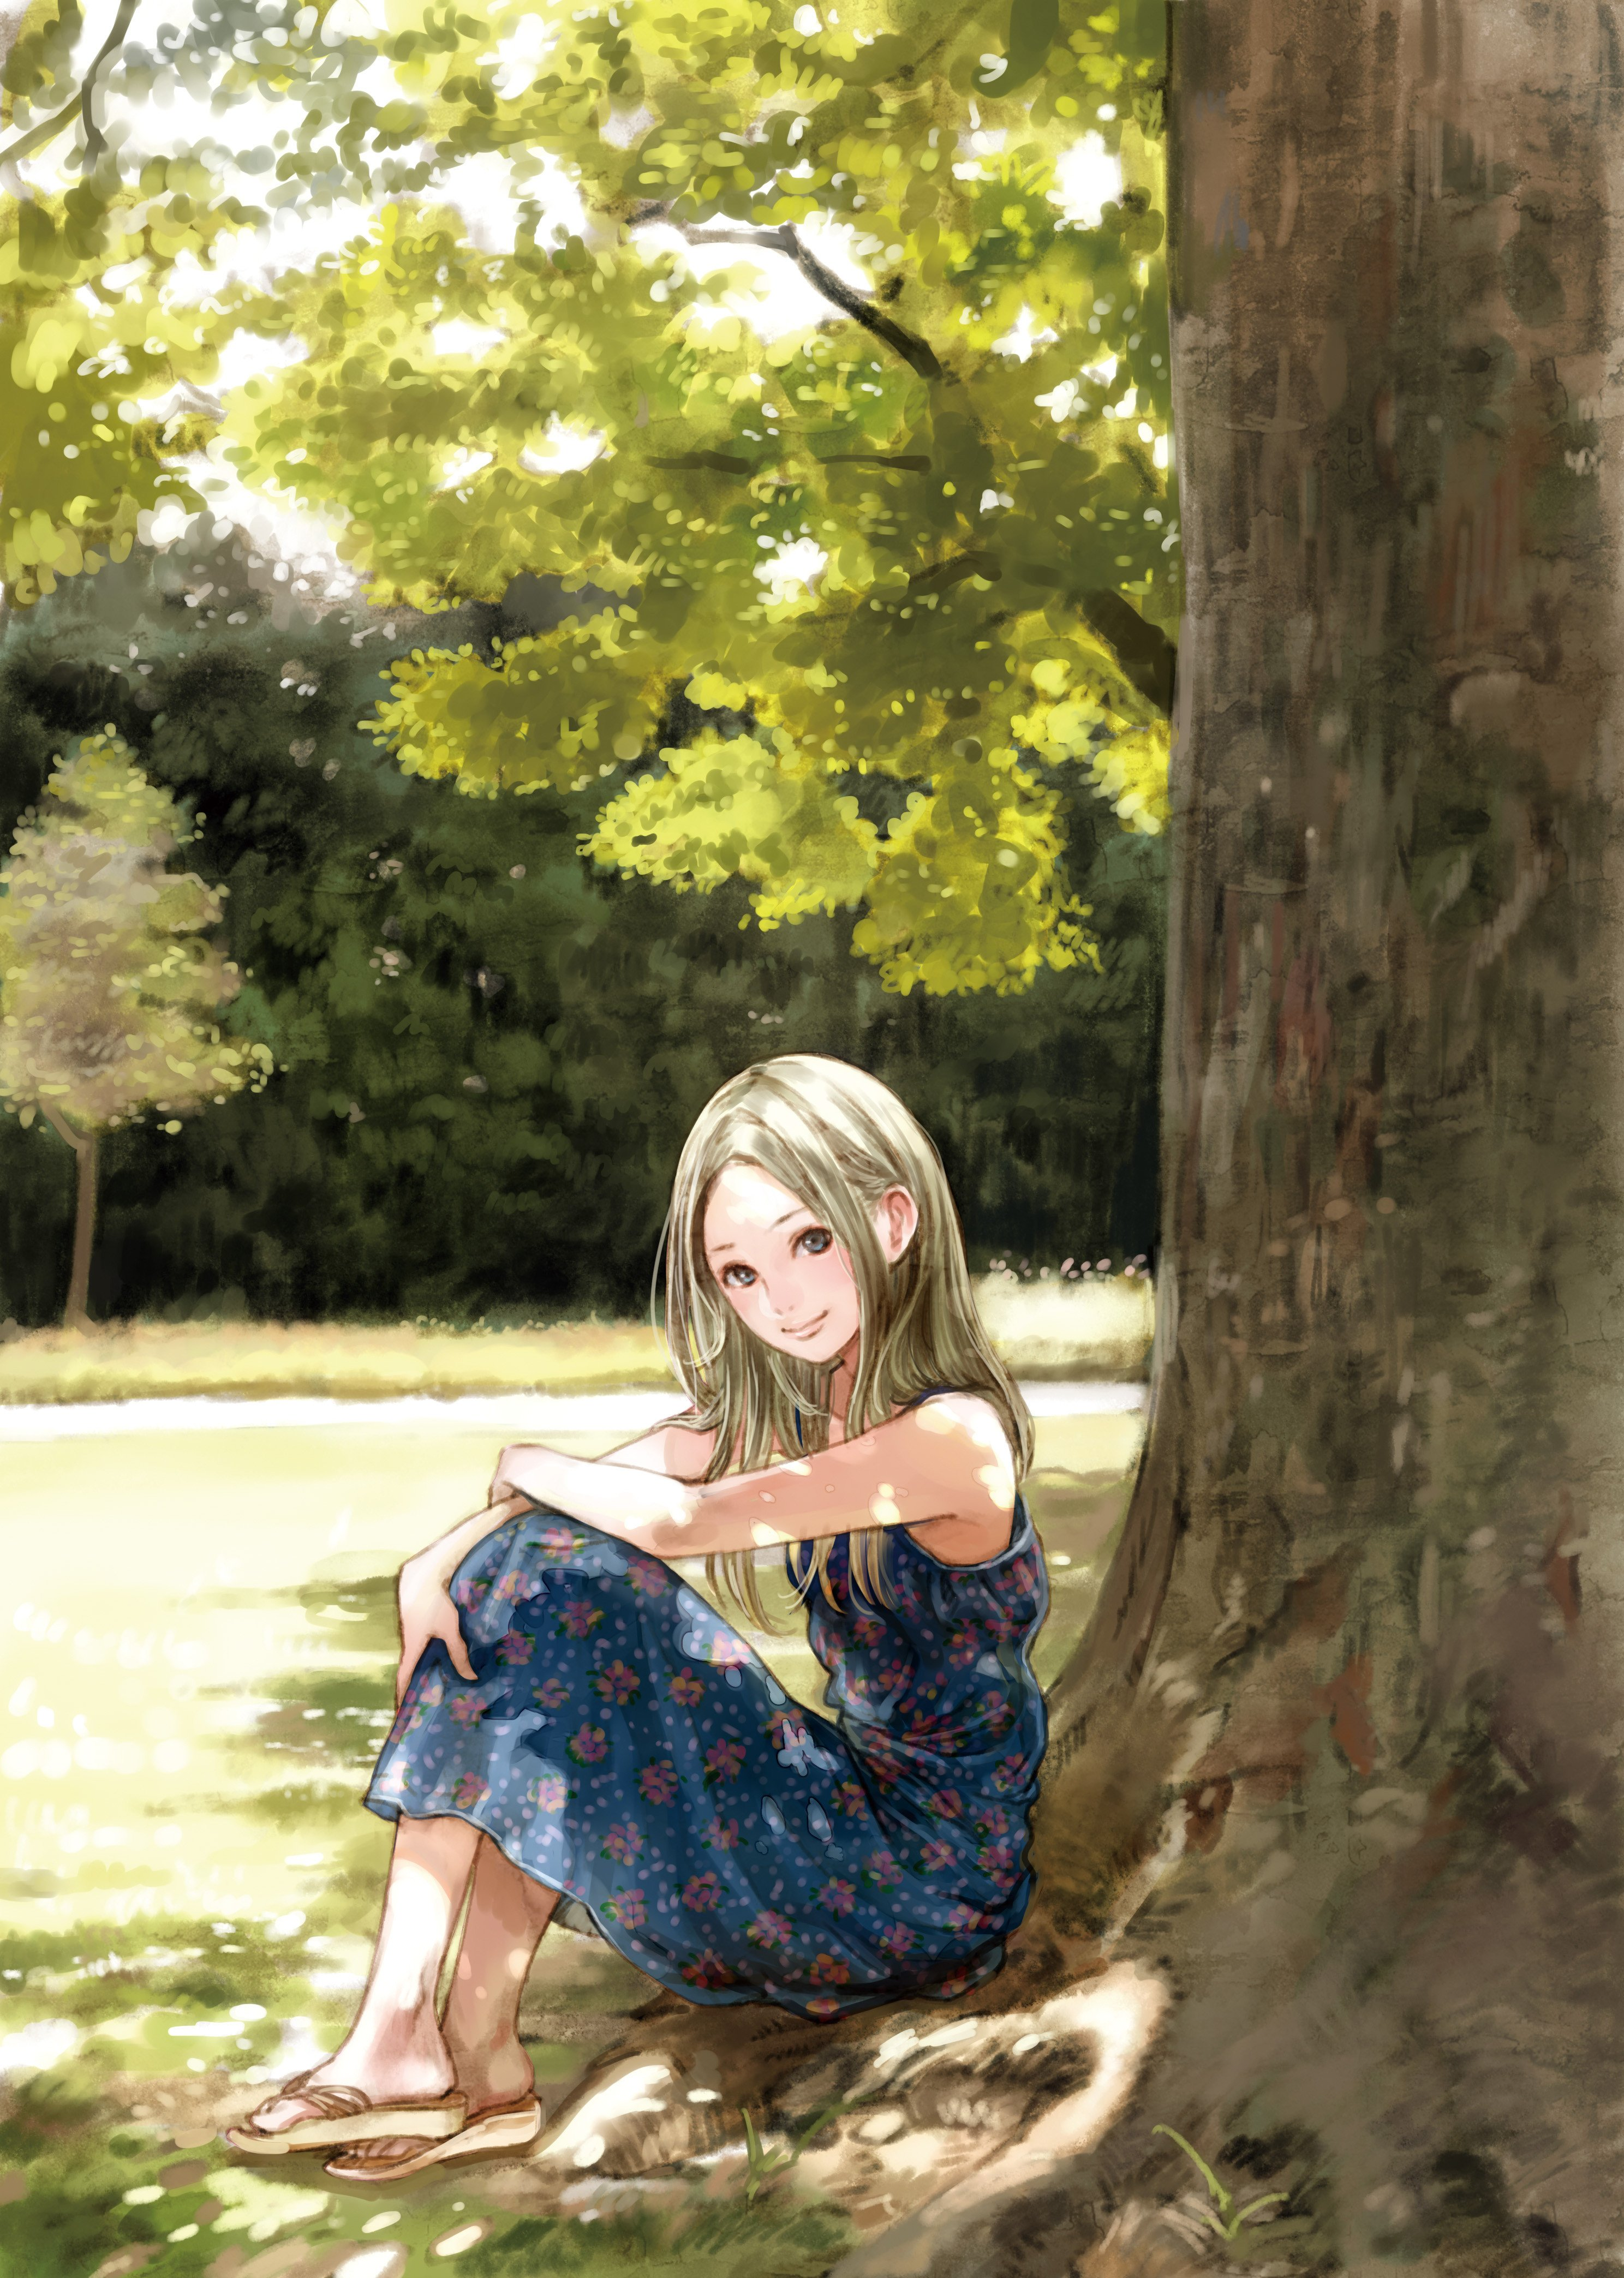 anime elf tree nature dress girl wallpaper 2976x4175